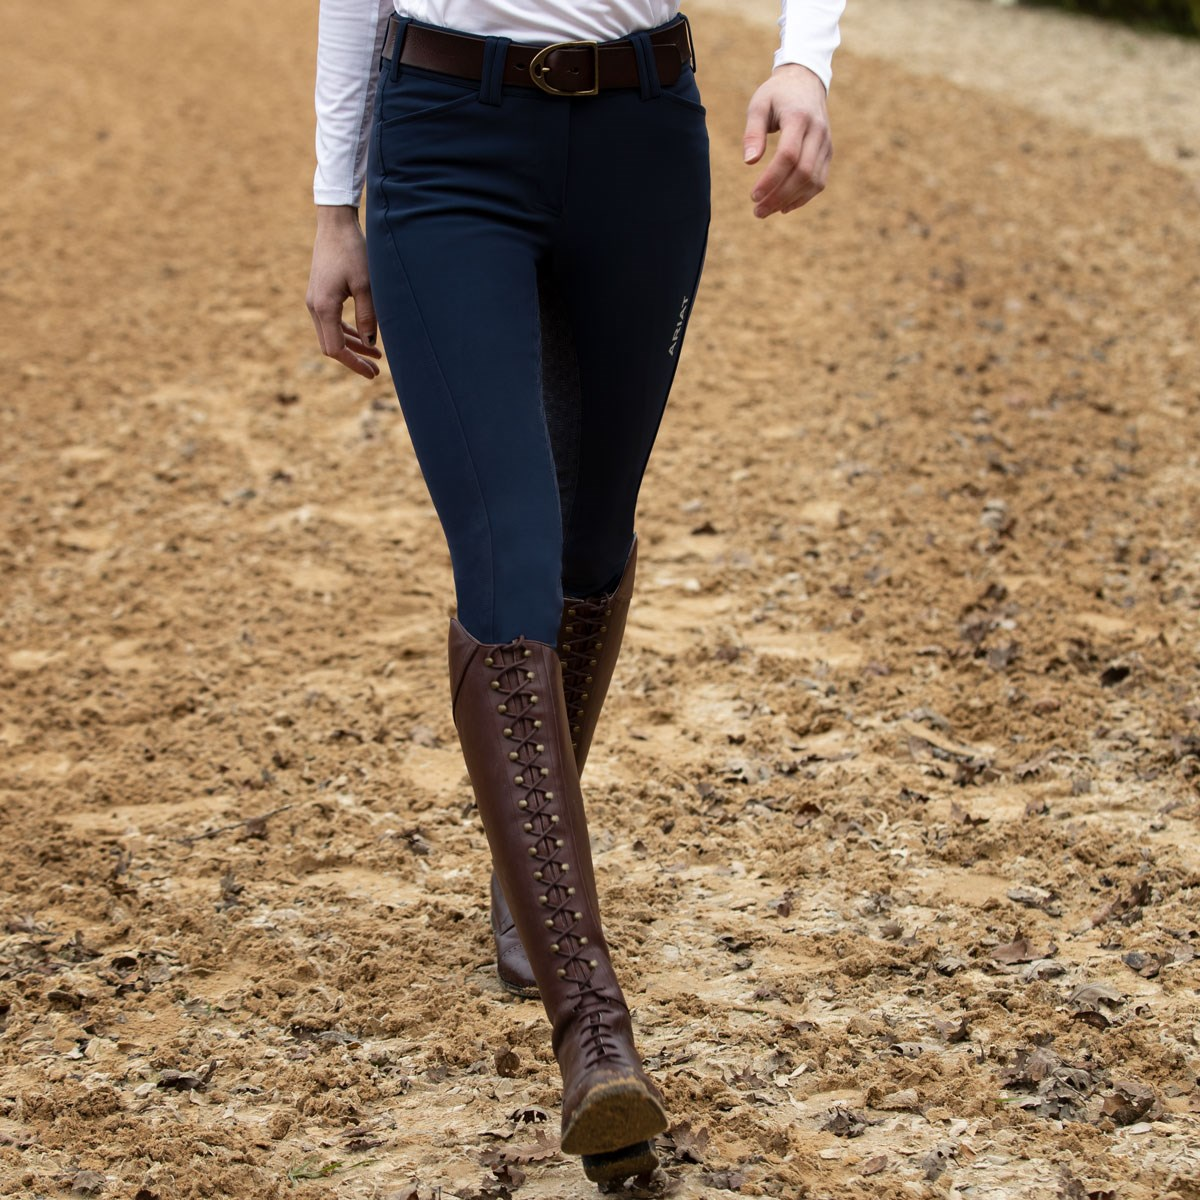 3a840170b85 Ariat Capriole Ladies Tall Riding Boots - Mahogany